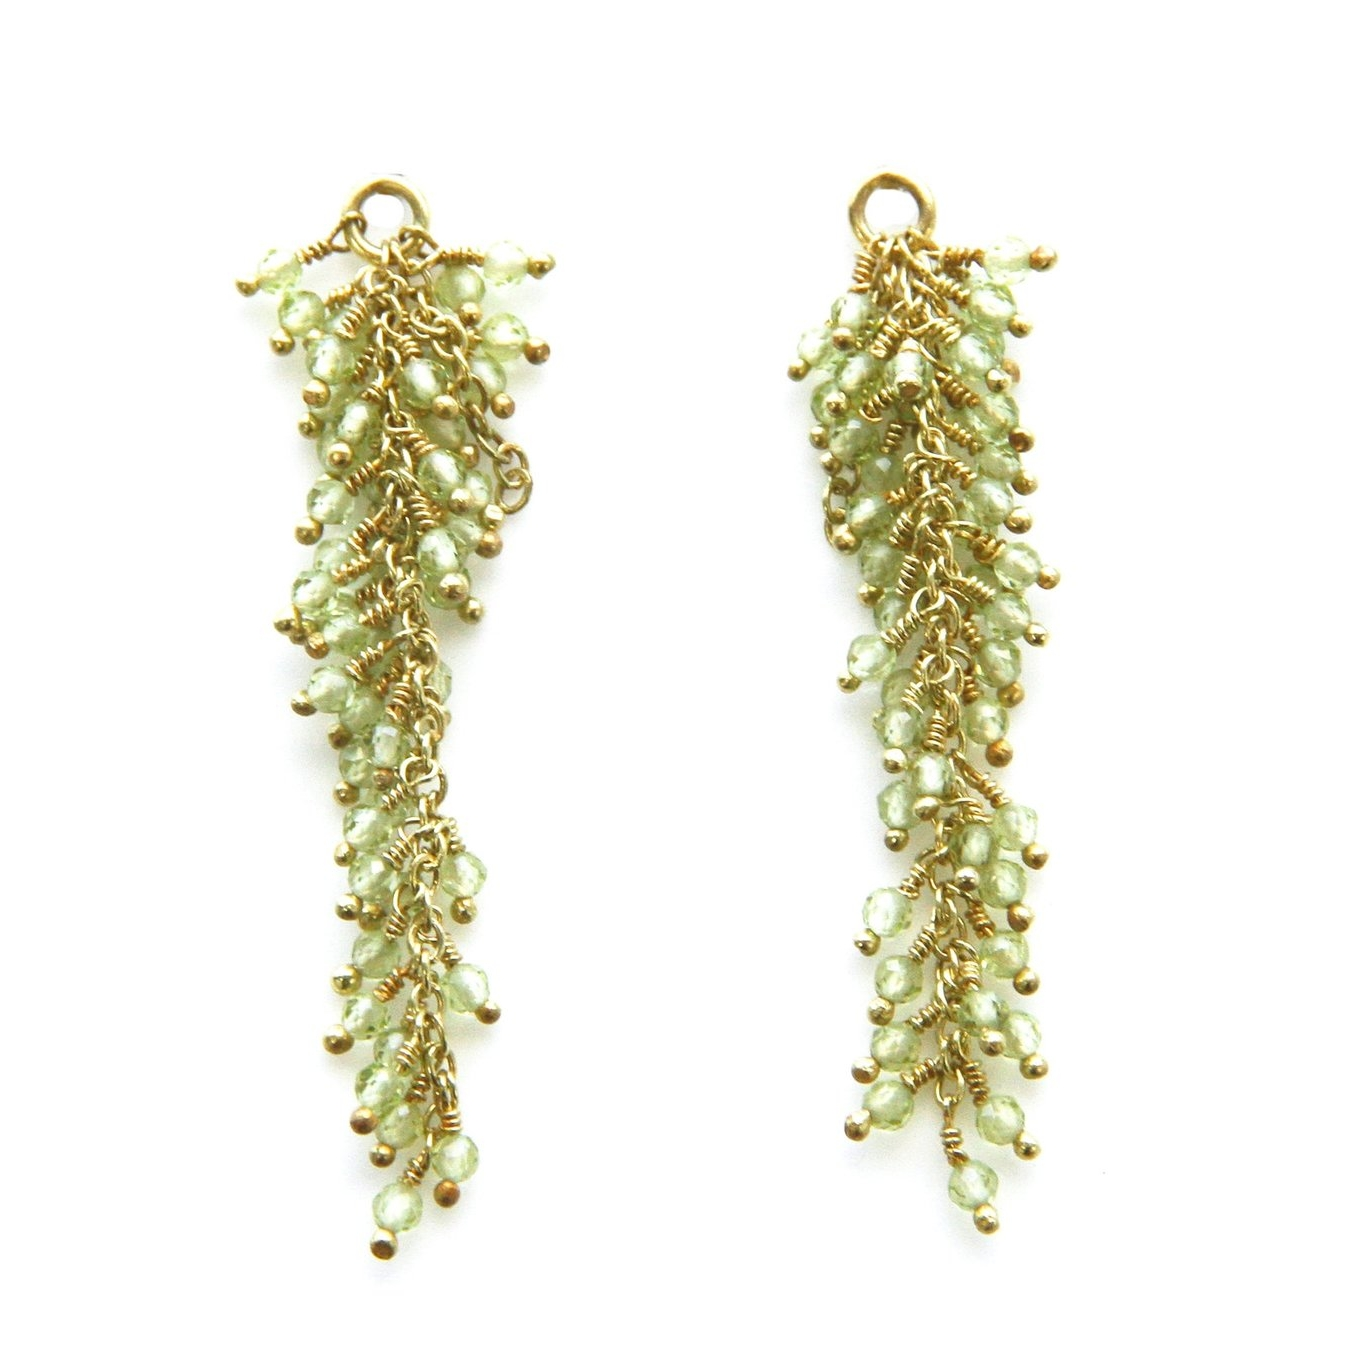 Sian Evans Jewellery -